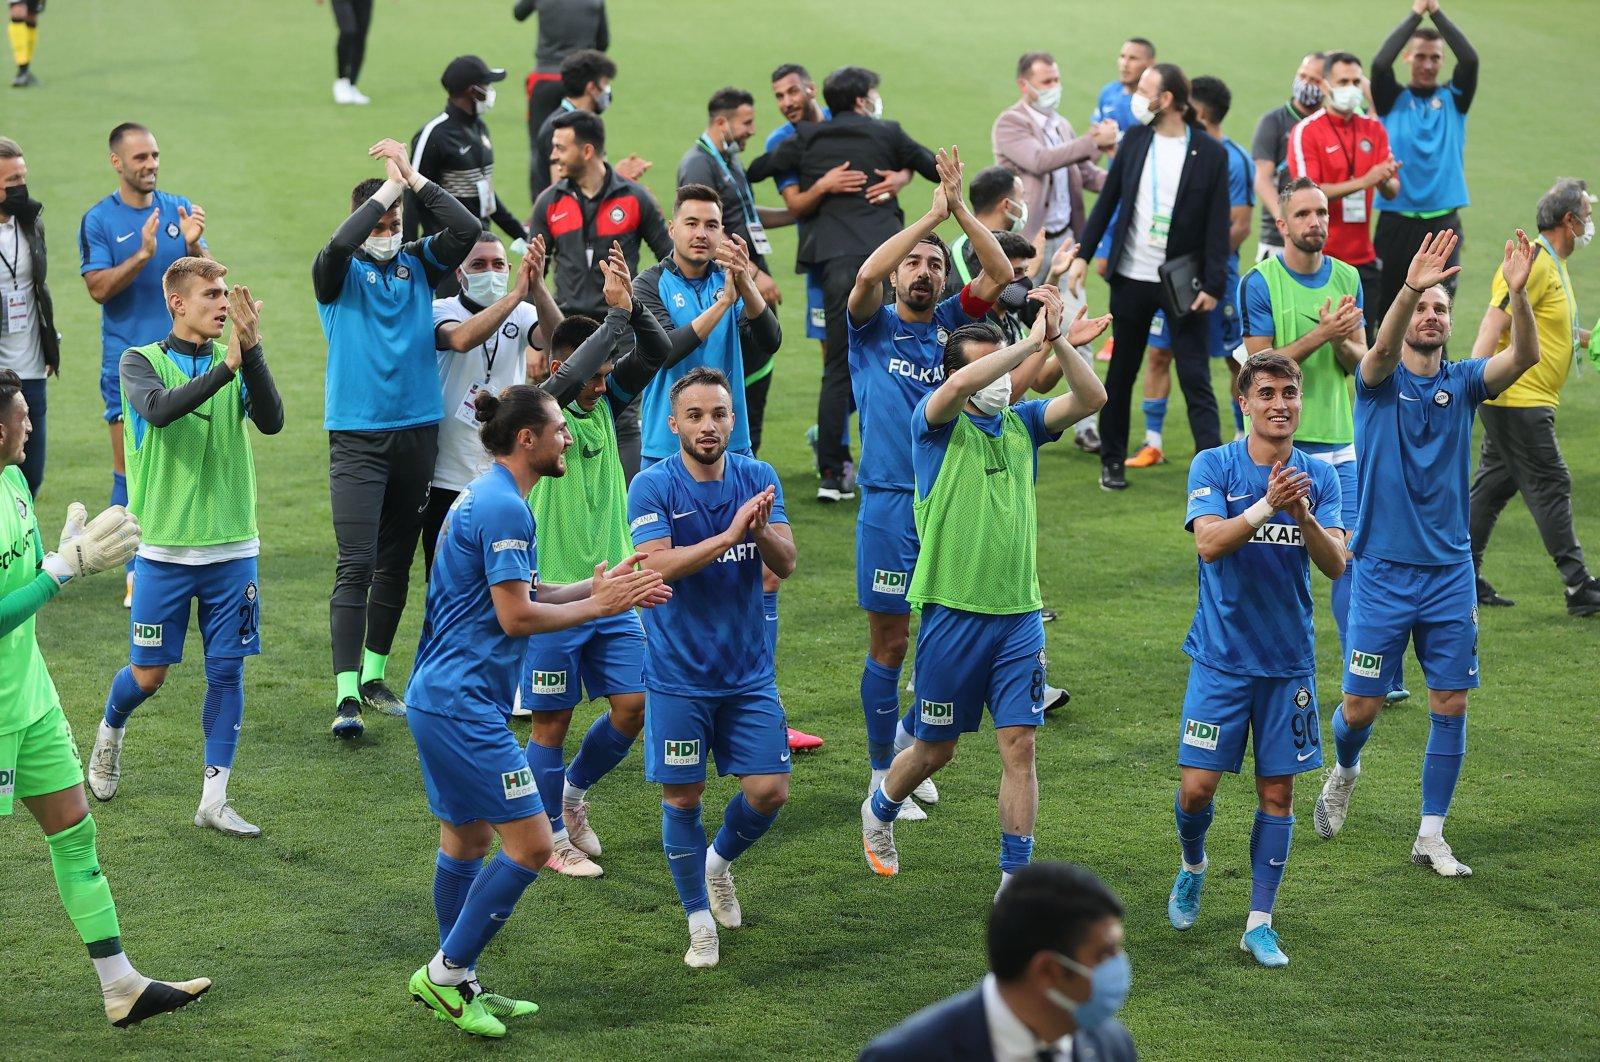 Altay, Altınordu tie in Izmir final for last ticket to Turkish Süper Lig